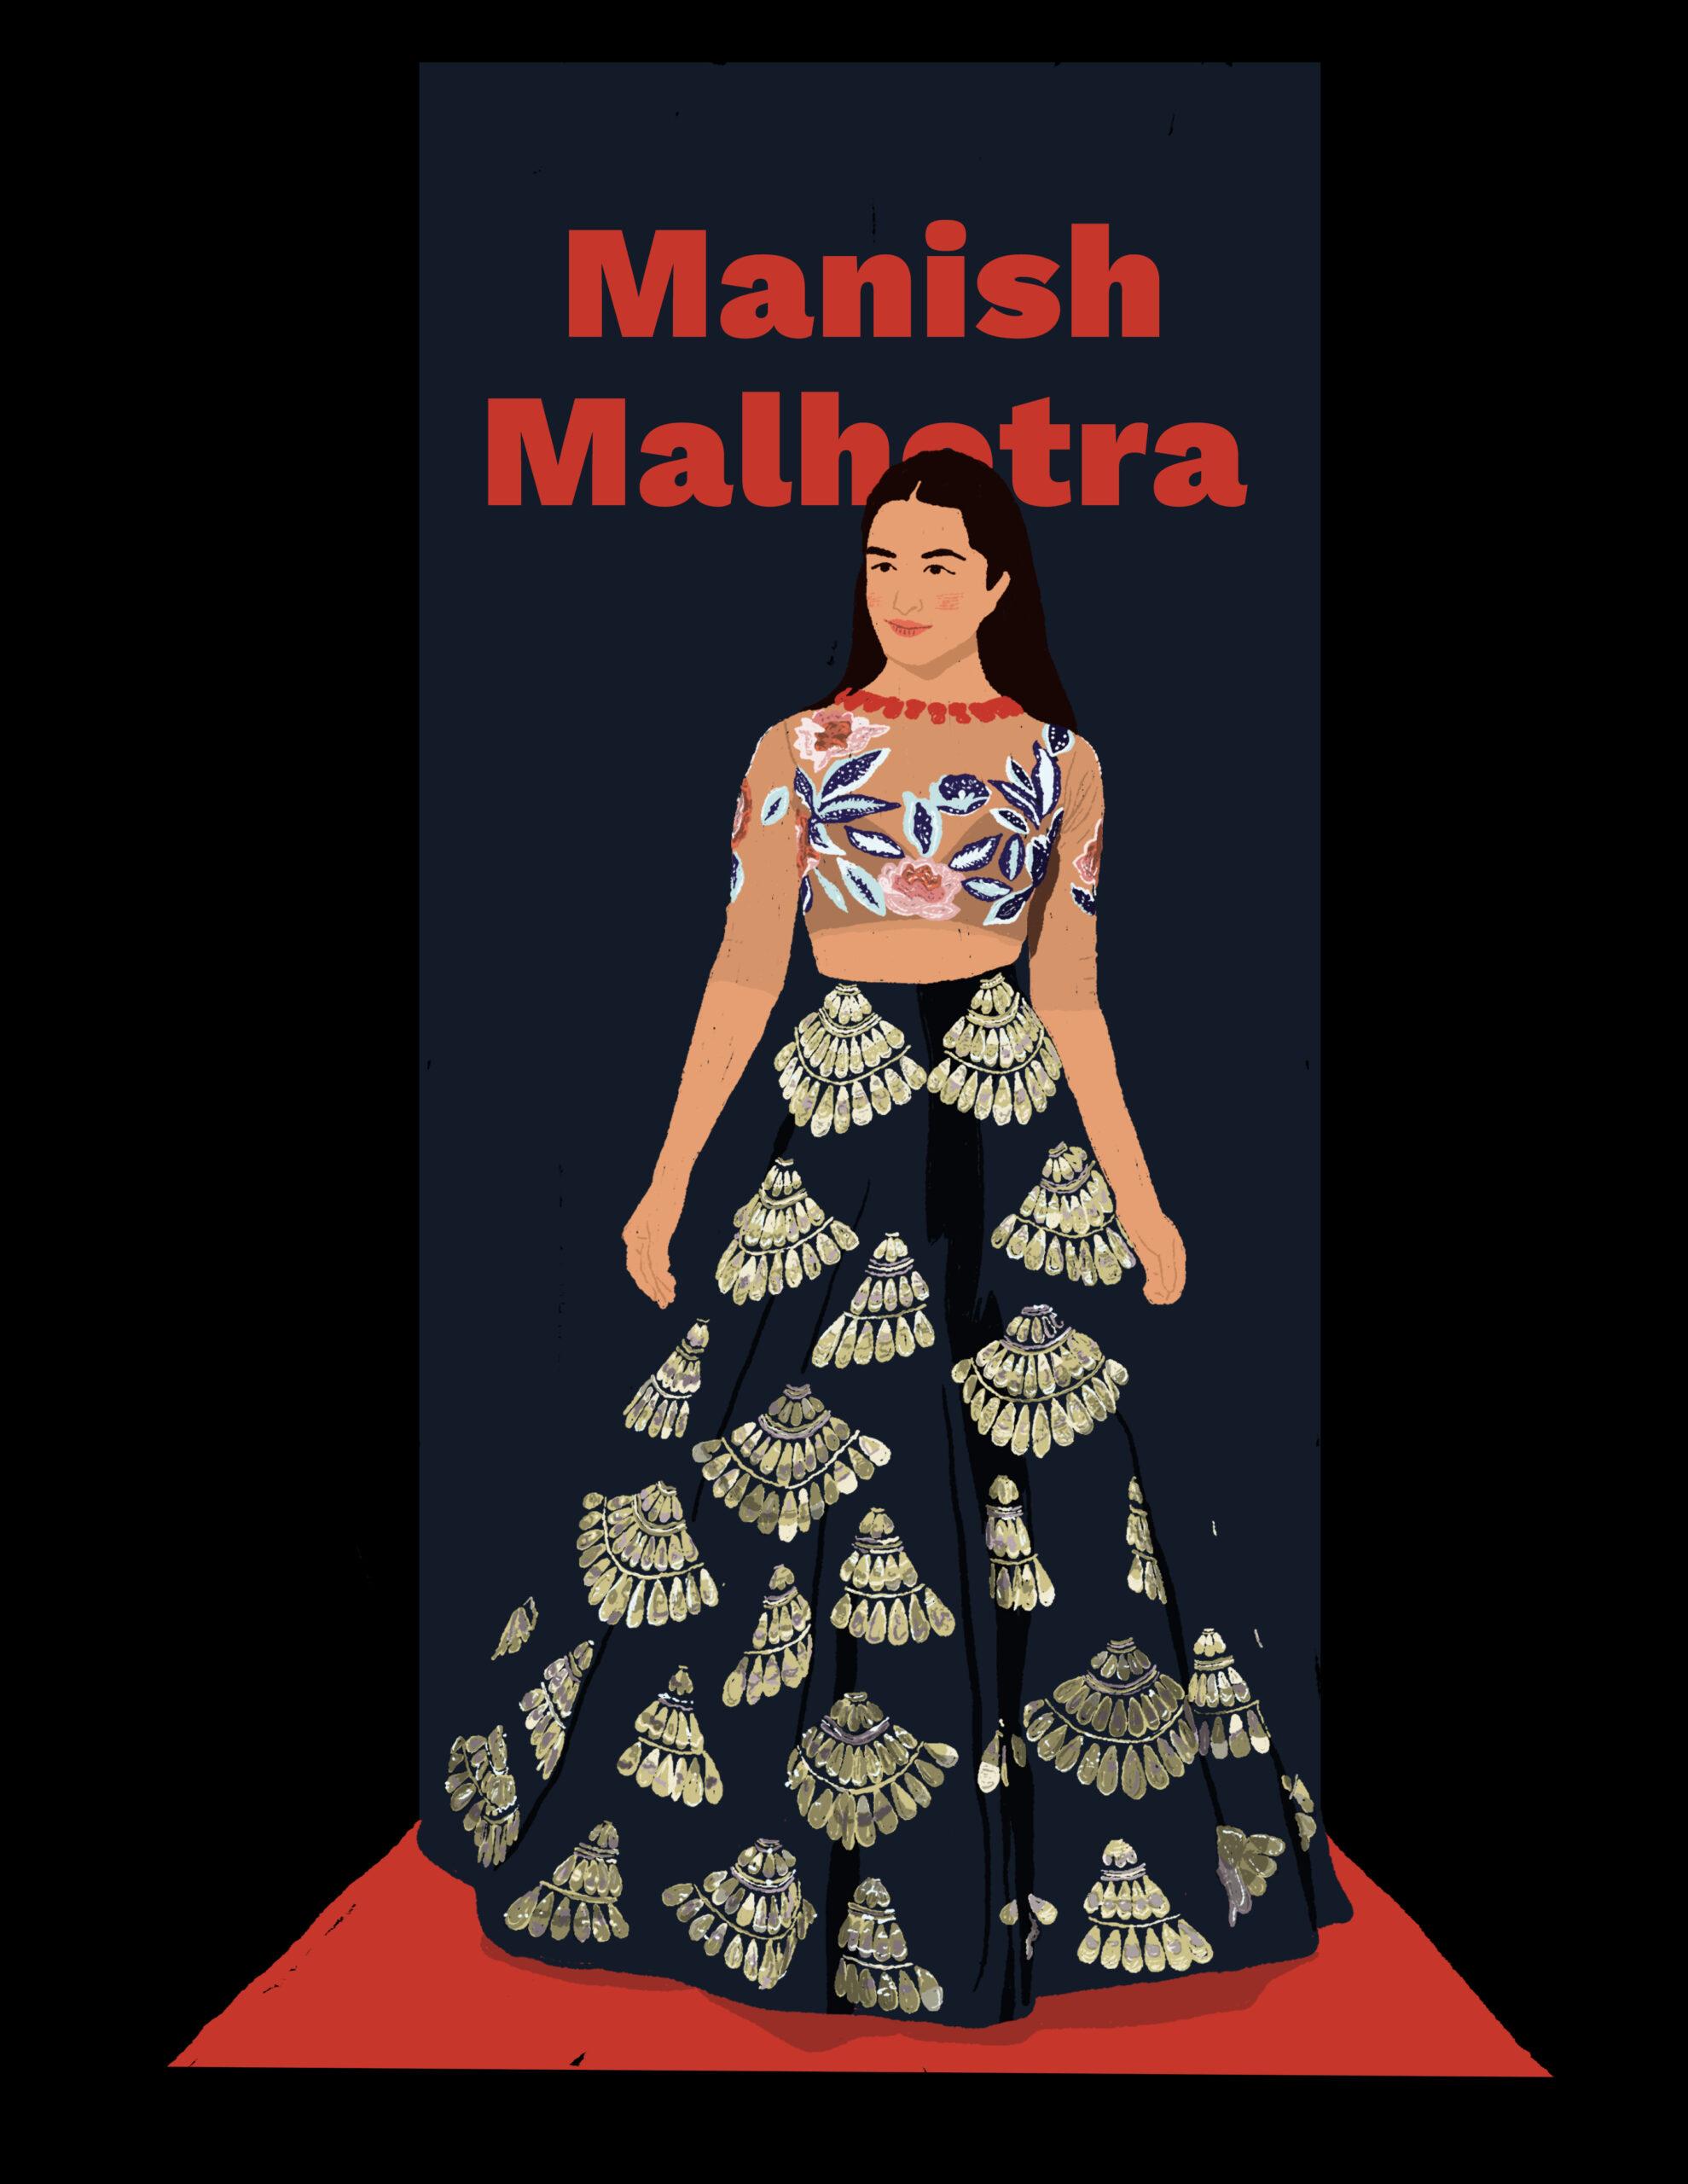 Manish-Malhotra